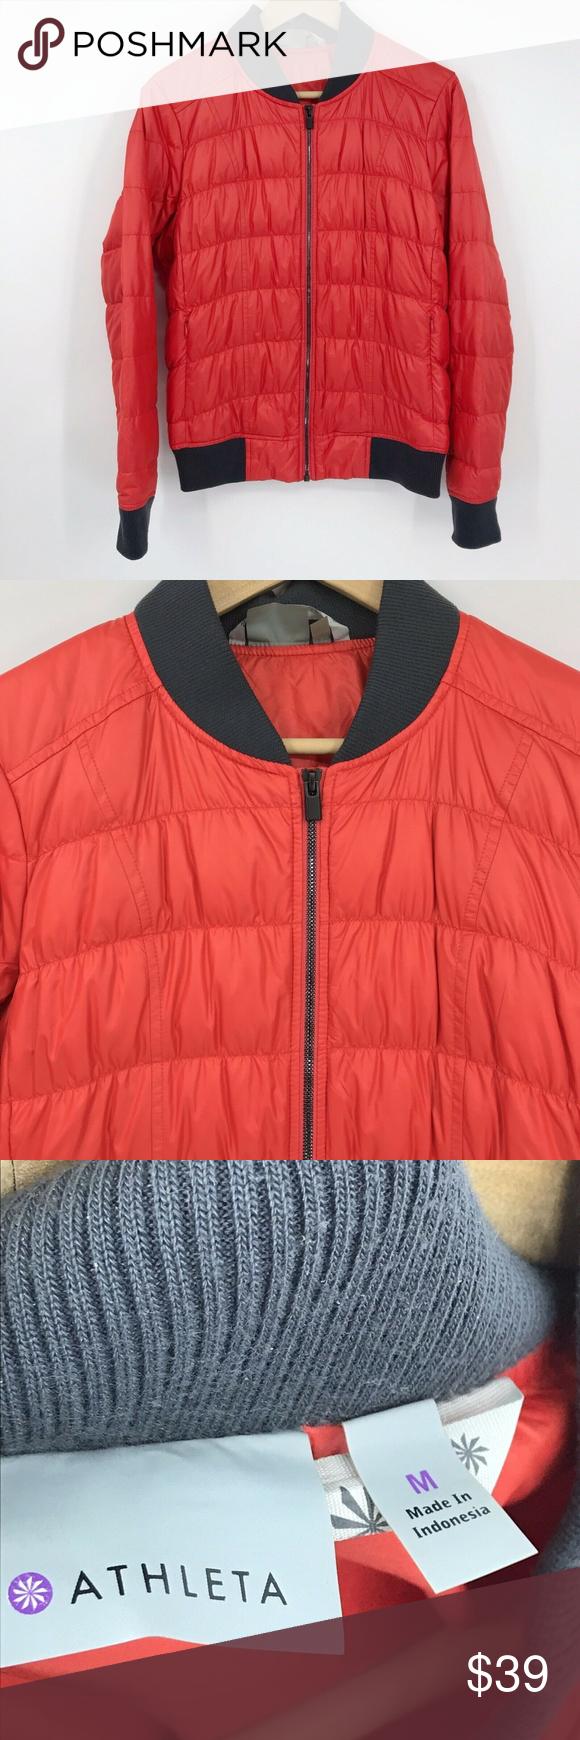 Athleta Goose Down Bomber Puffer Jacket Red Sz M Athleta Women S Down Bomber Jacket Full Zip Zip Pockets Ribbed Cuffs Neckli Red Jacket Jackets Puffer Jackets [ 1740 x 580 Pixel ]